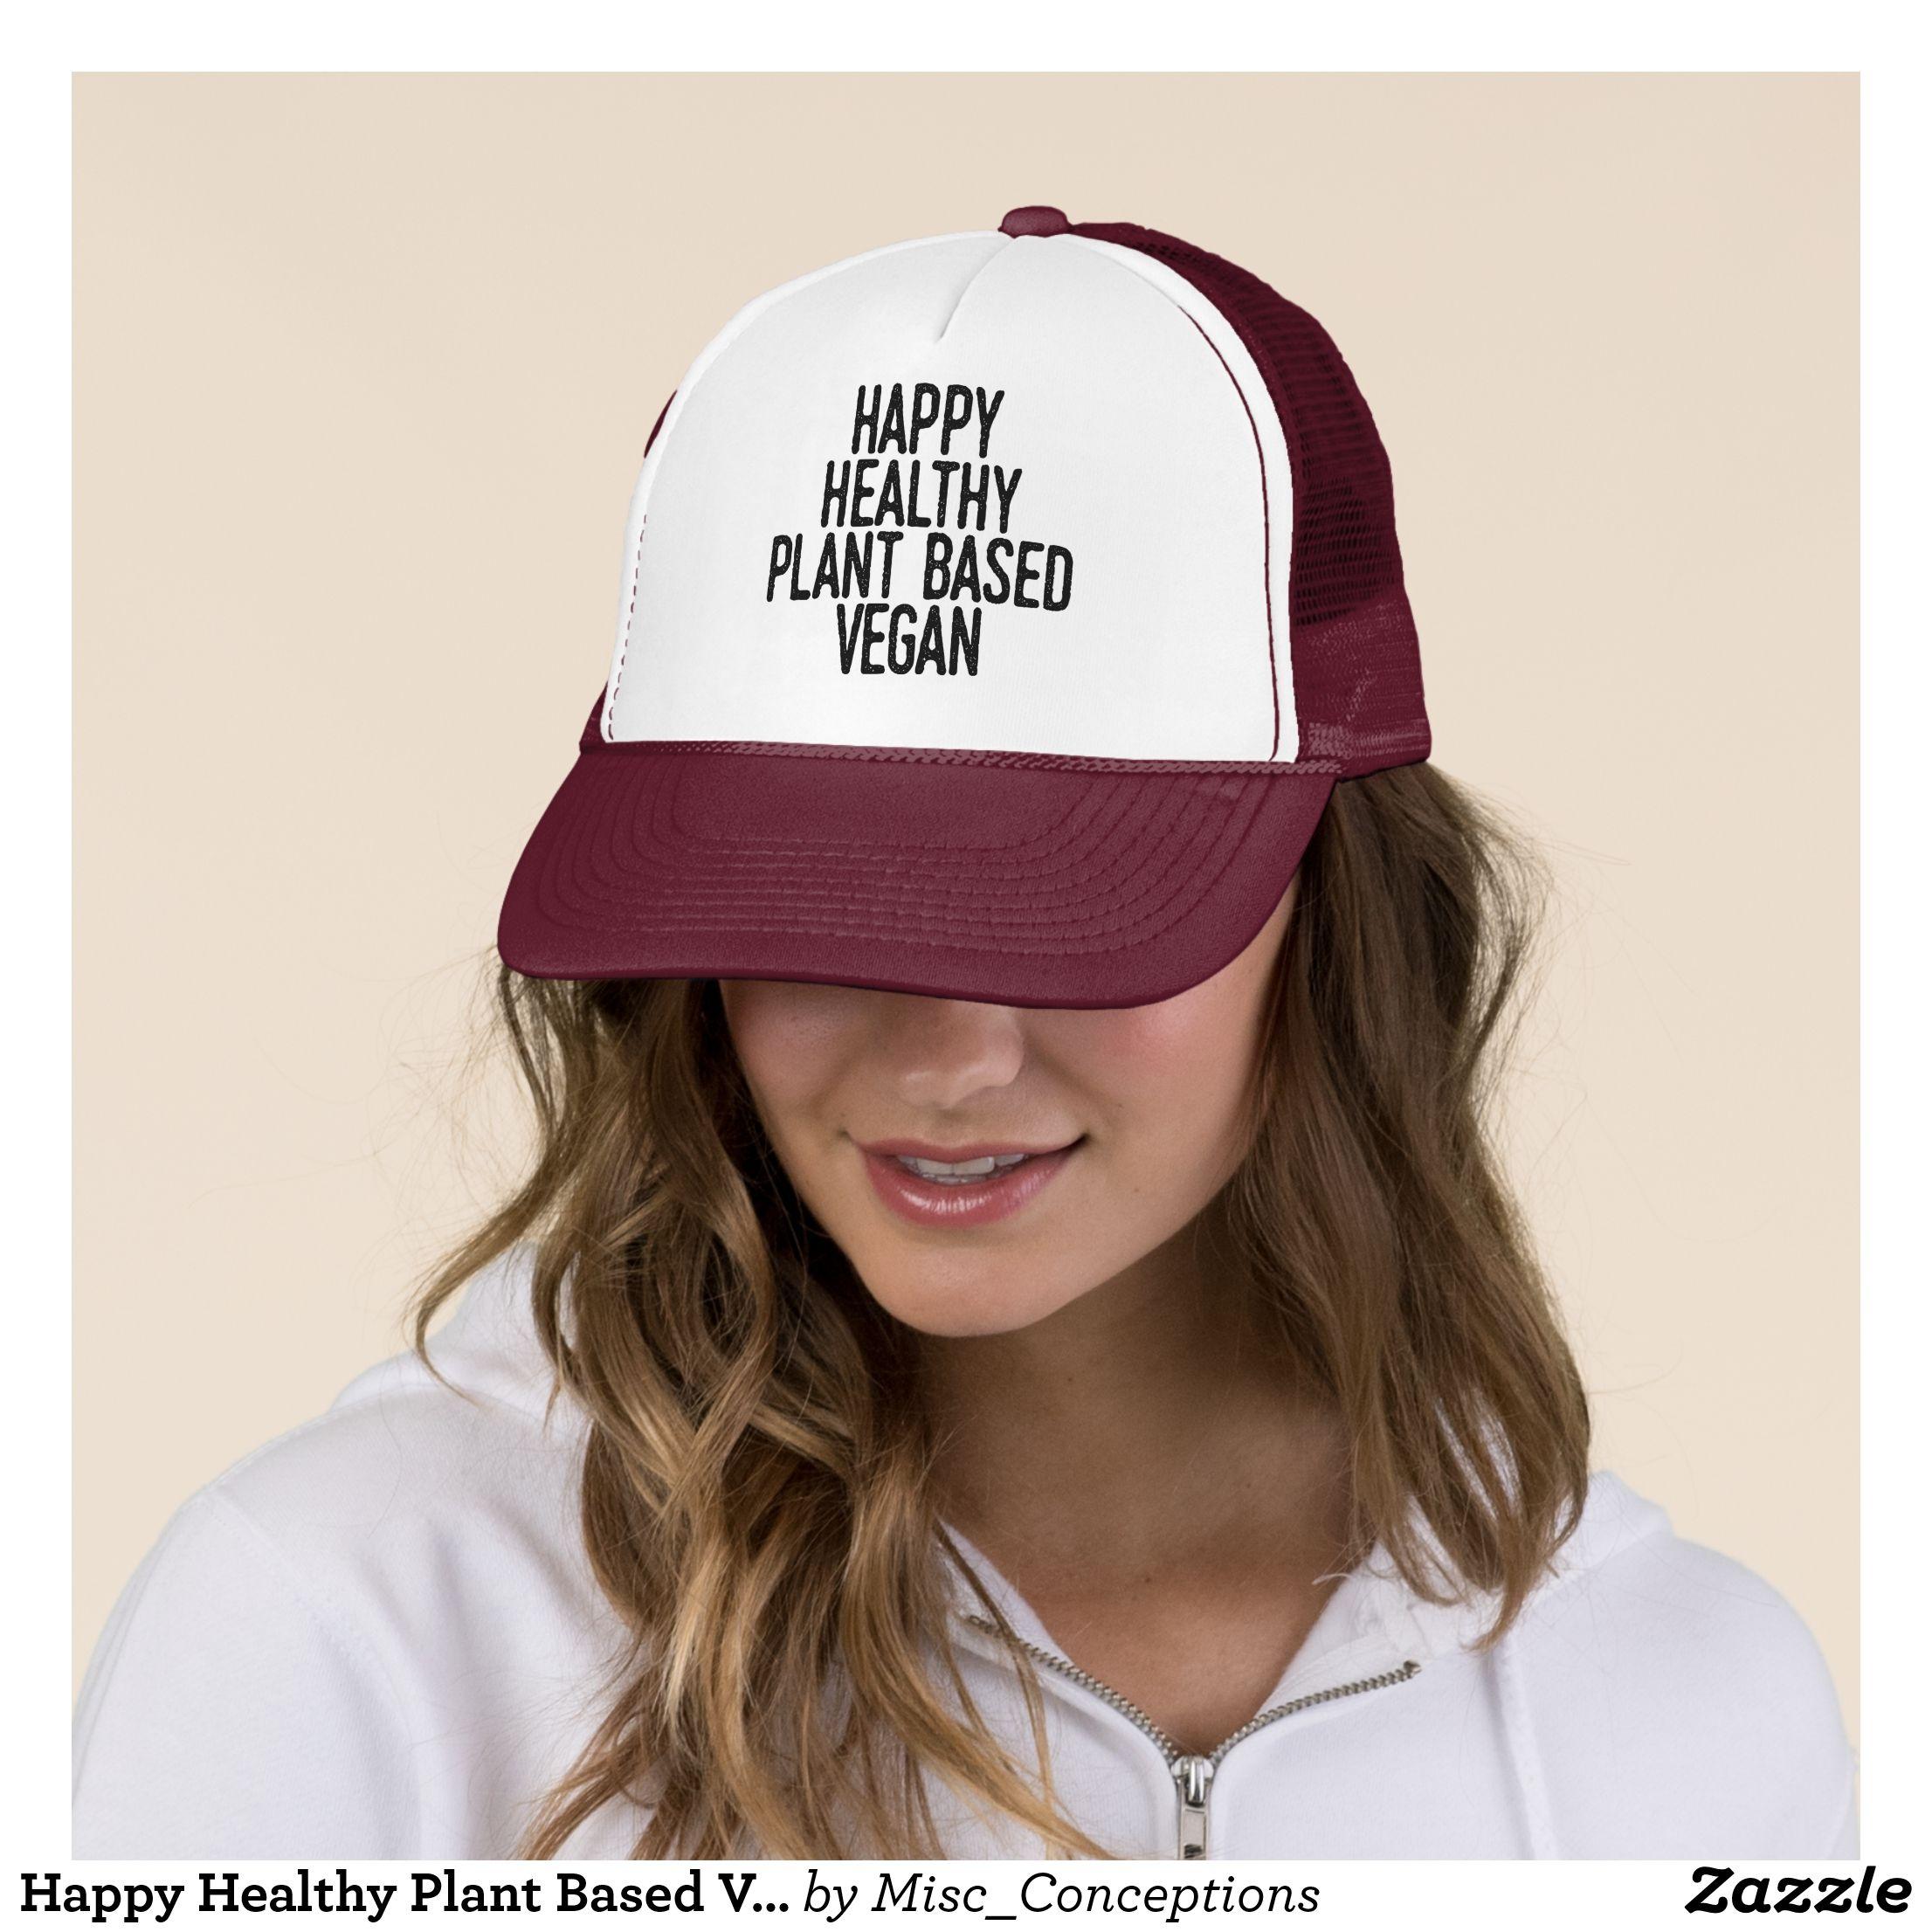 9781dd75 Happy Healthy Plant Based Vegan (blk) Trucker Hat - Urban Hunter Fisher  Farmer Redneck Hats By Talented Fashion And Graphic Designers - #hats  #truckerhat ...